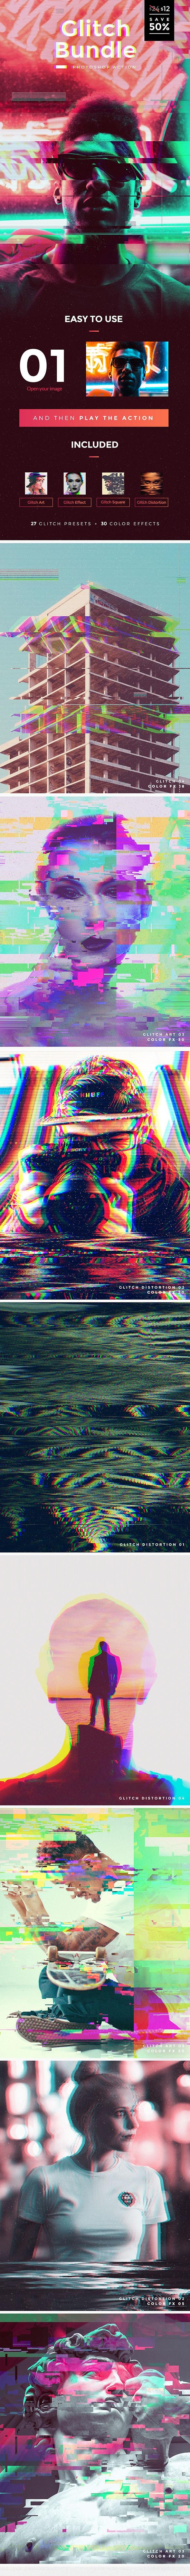 Glitch Bundle Photoshop Actions - Photo Effects Actions